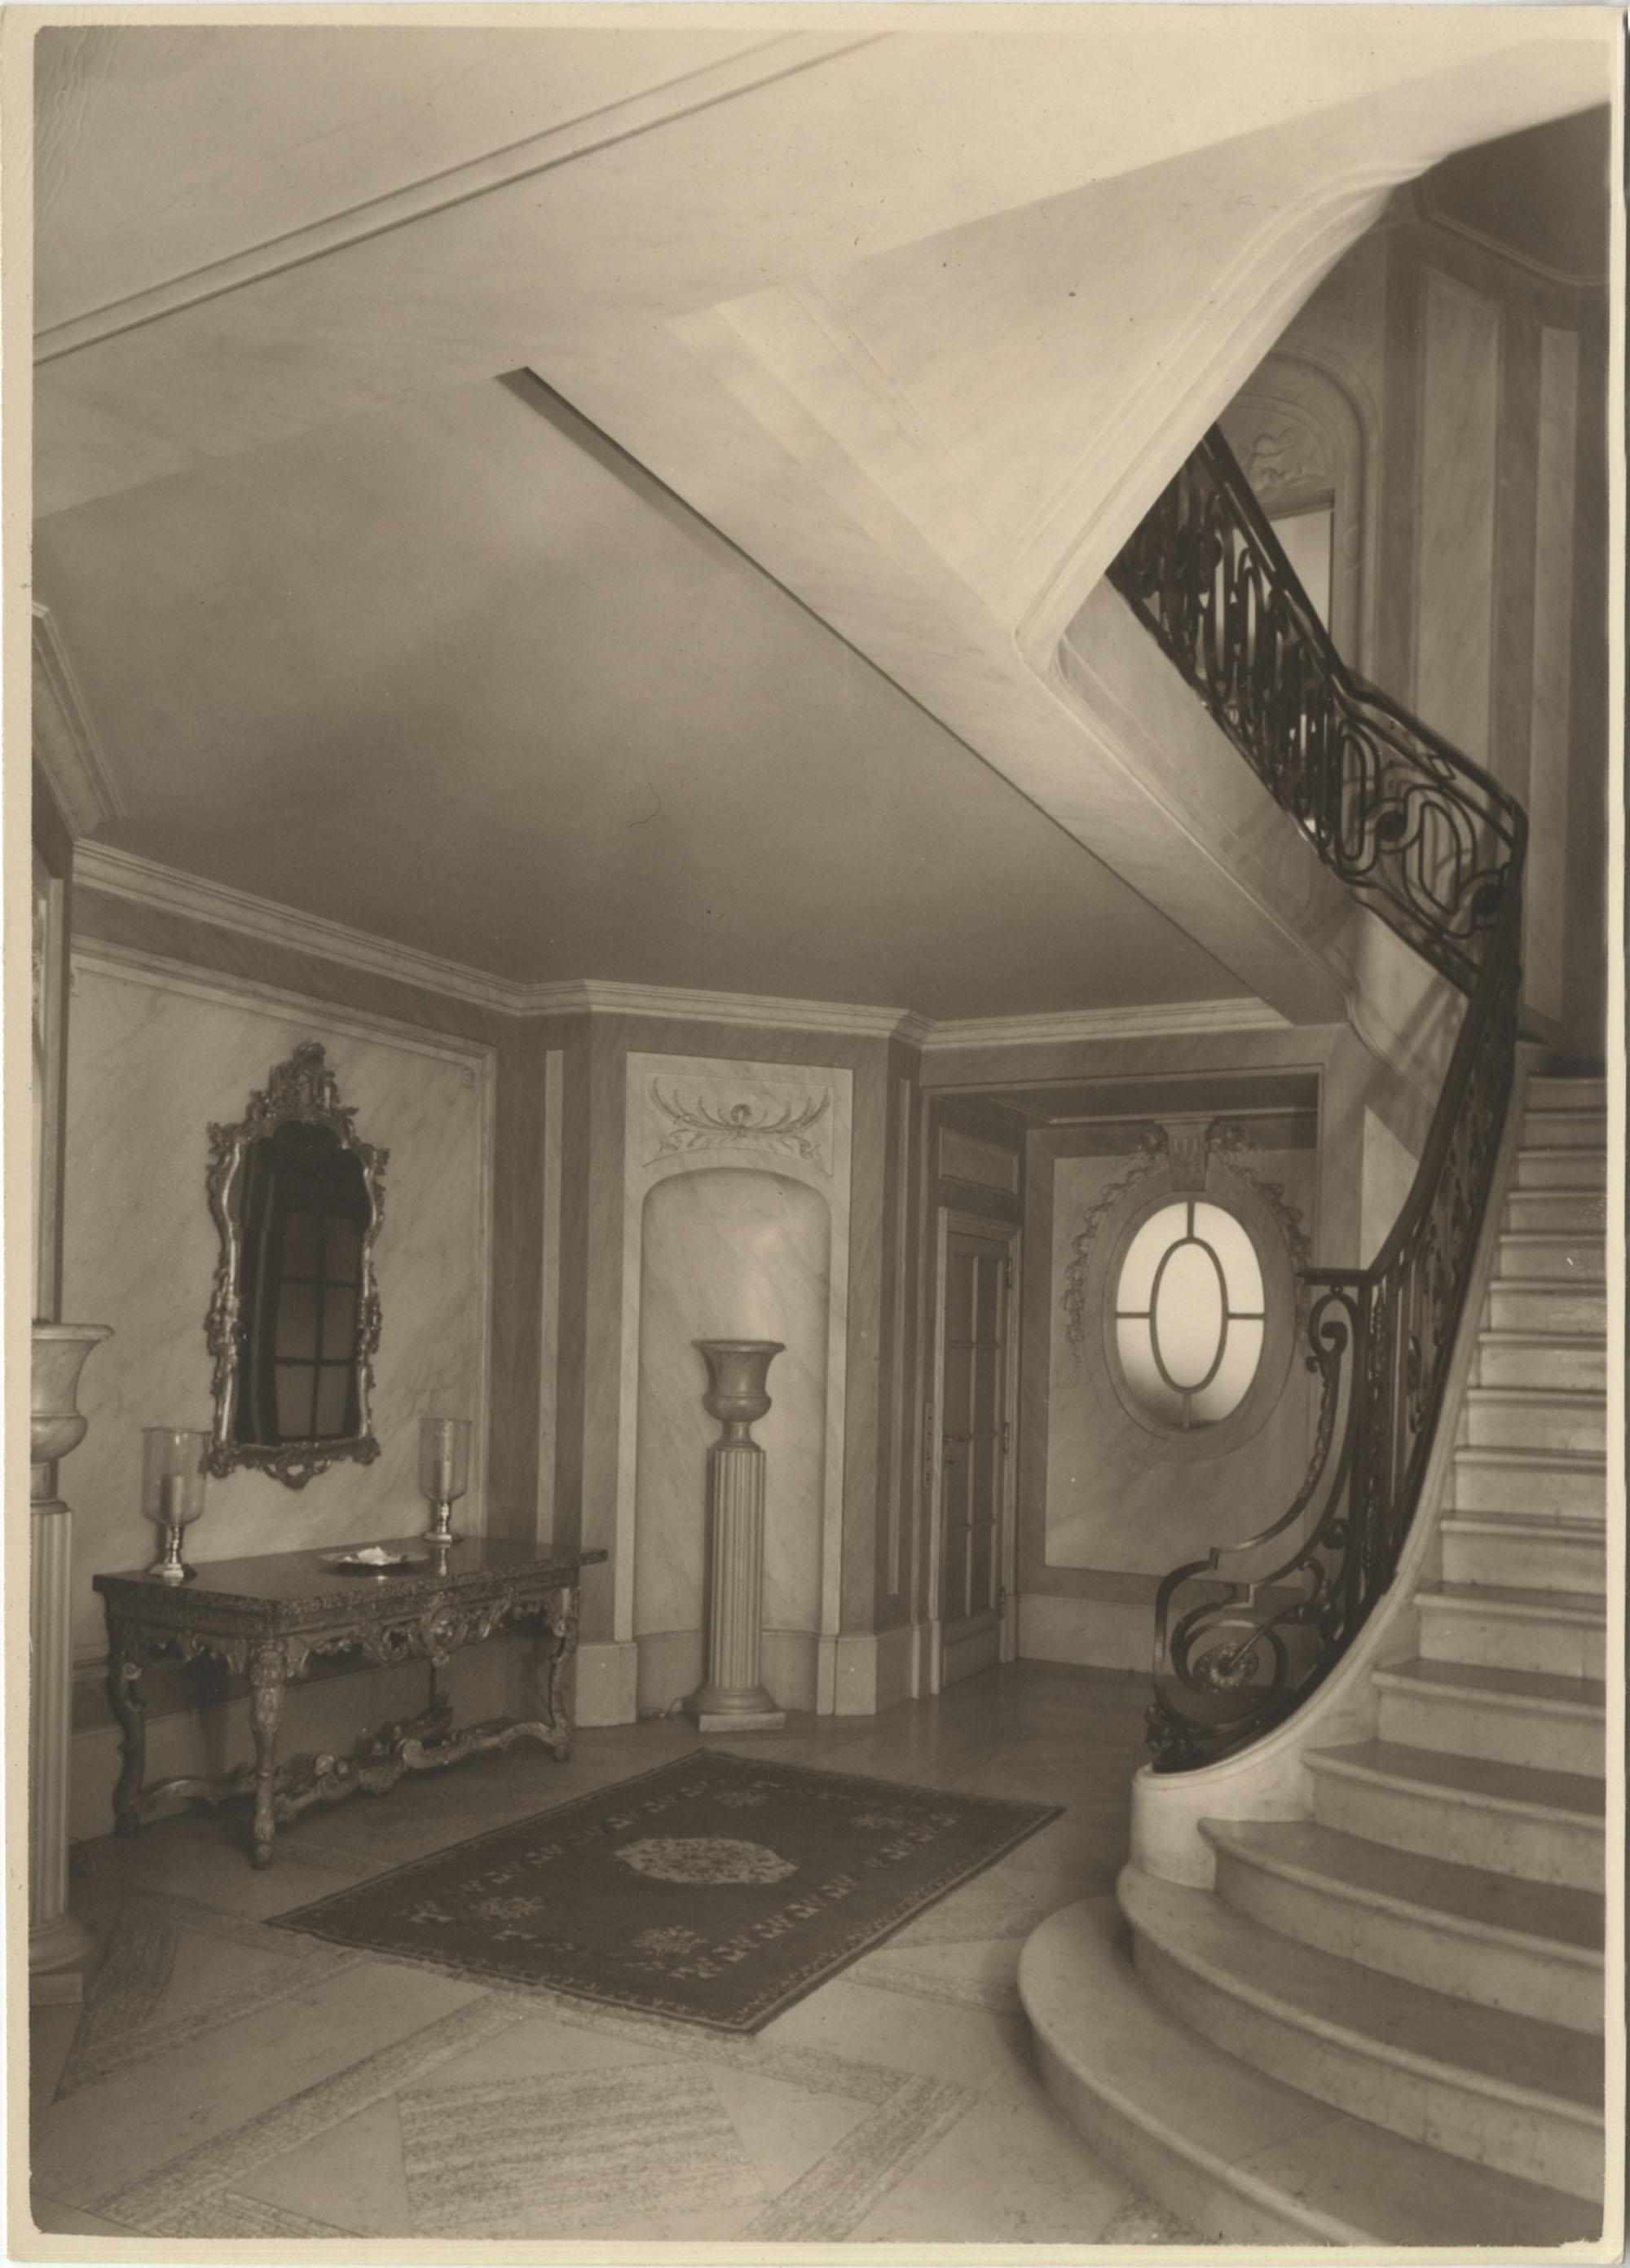 Entrance hallway in the Royal Italian Consul in Sri Lanka, Photograph 2